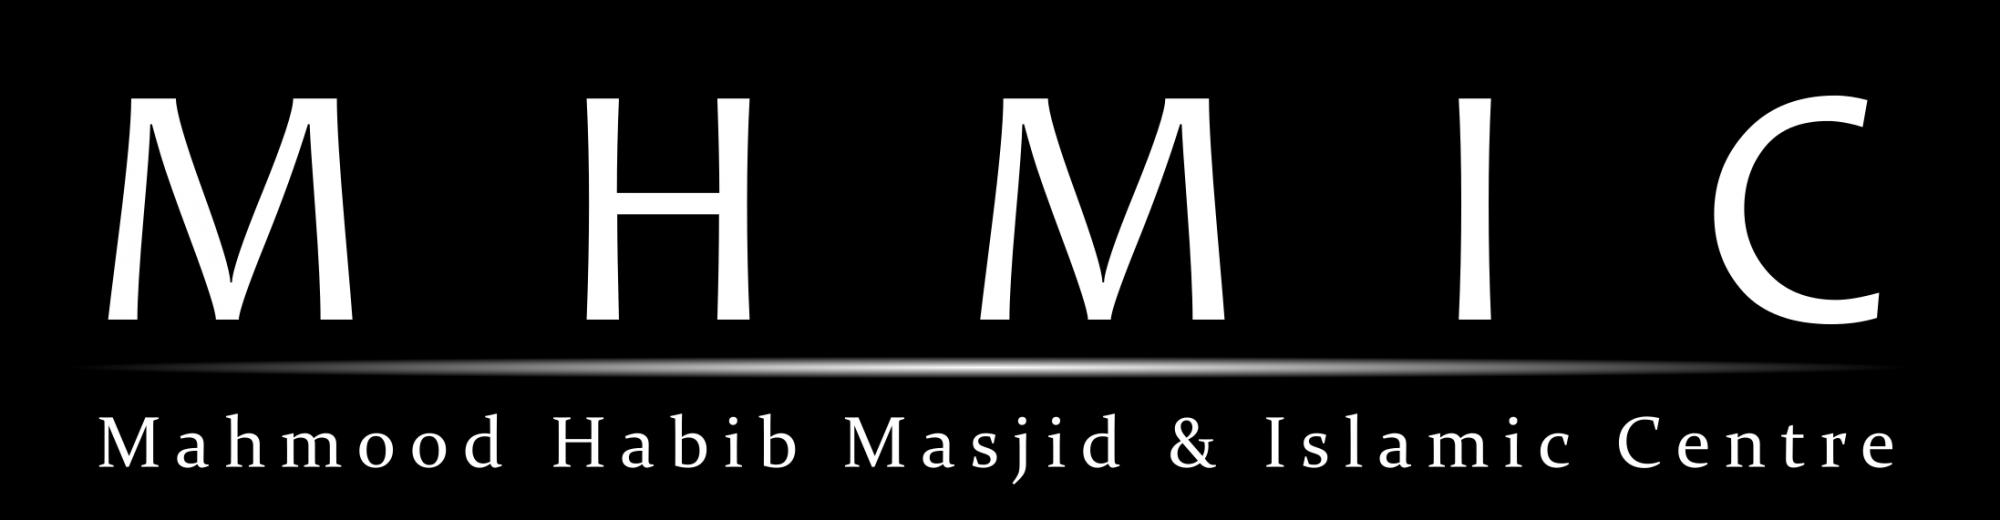 Fajr Reminders Archives - Mahmood Habib Masjid and Islamic